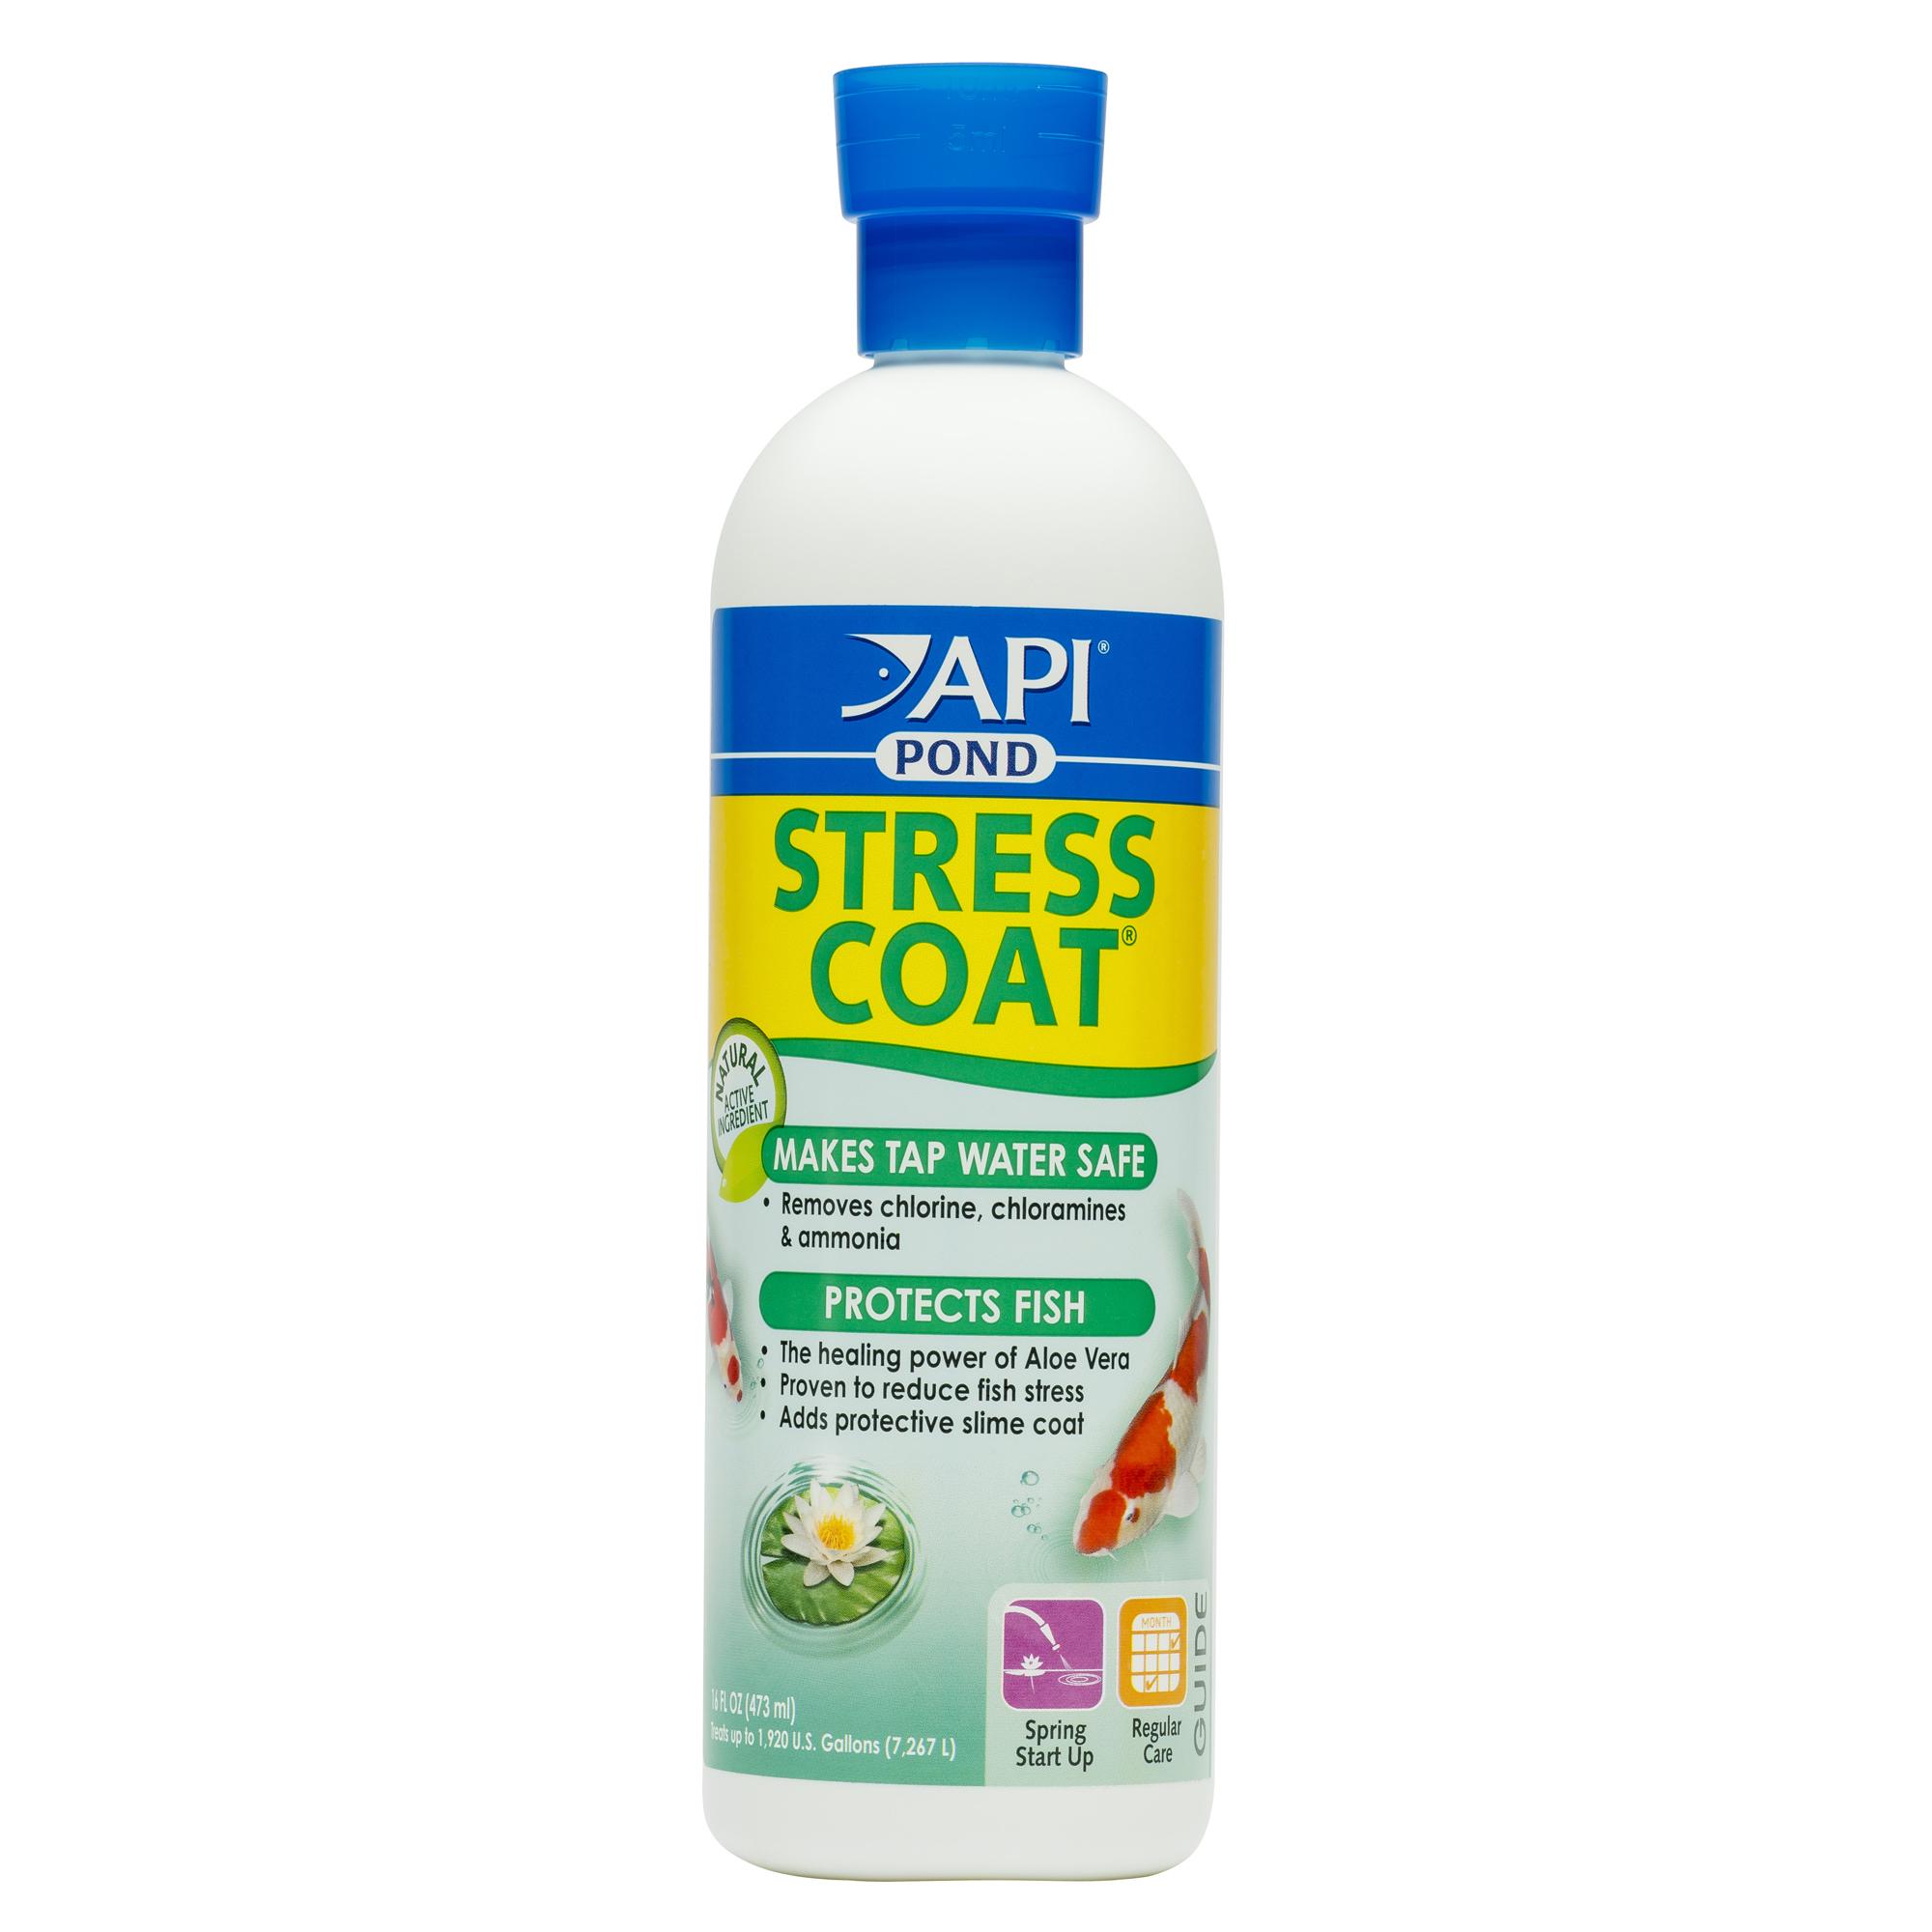 POND STRESS COAT™